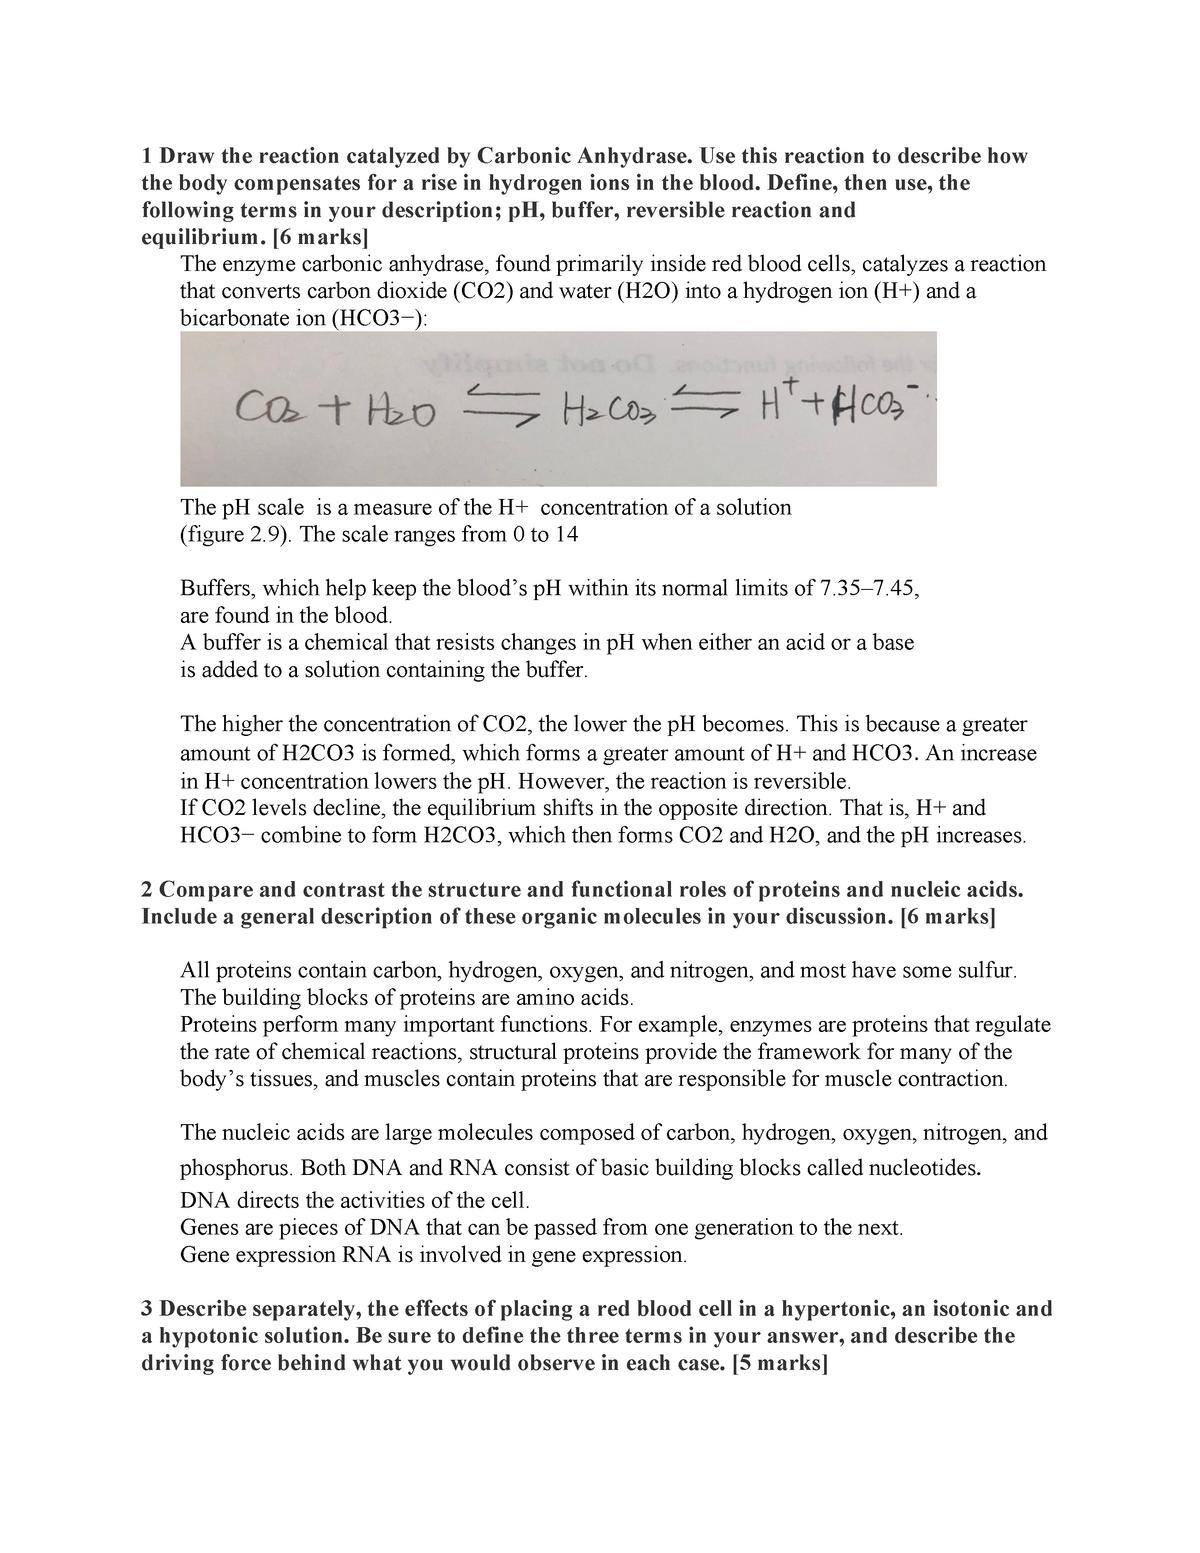 BPK Assignment 1 - Bpk 105 - SFU - StuDocu